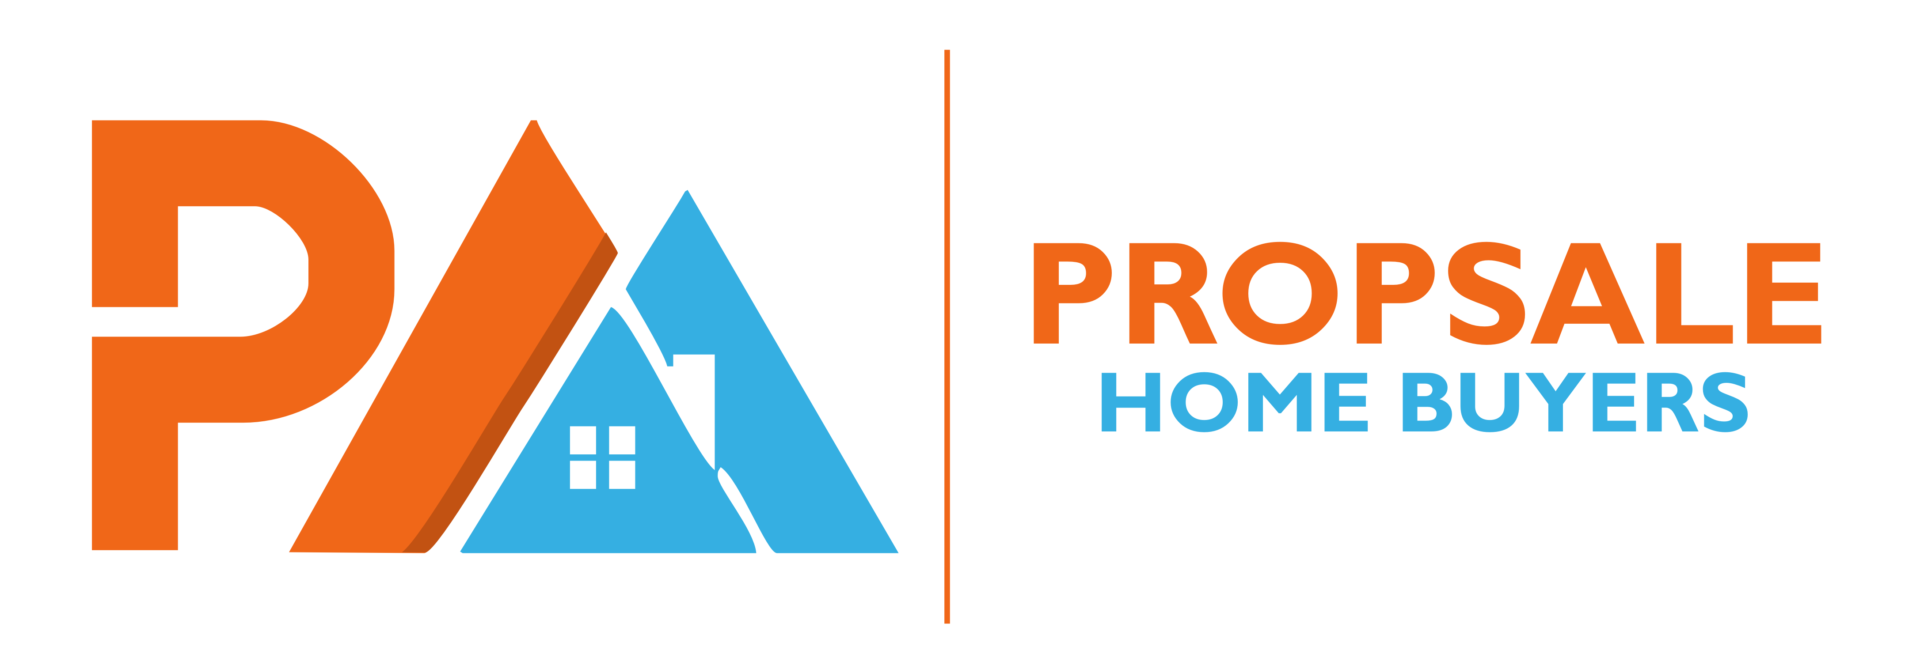 WE BUY HOMES CASH logo